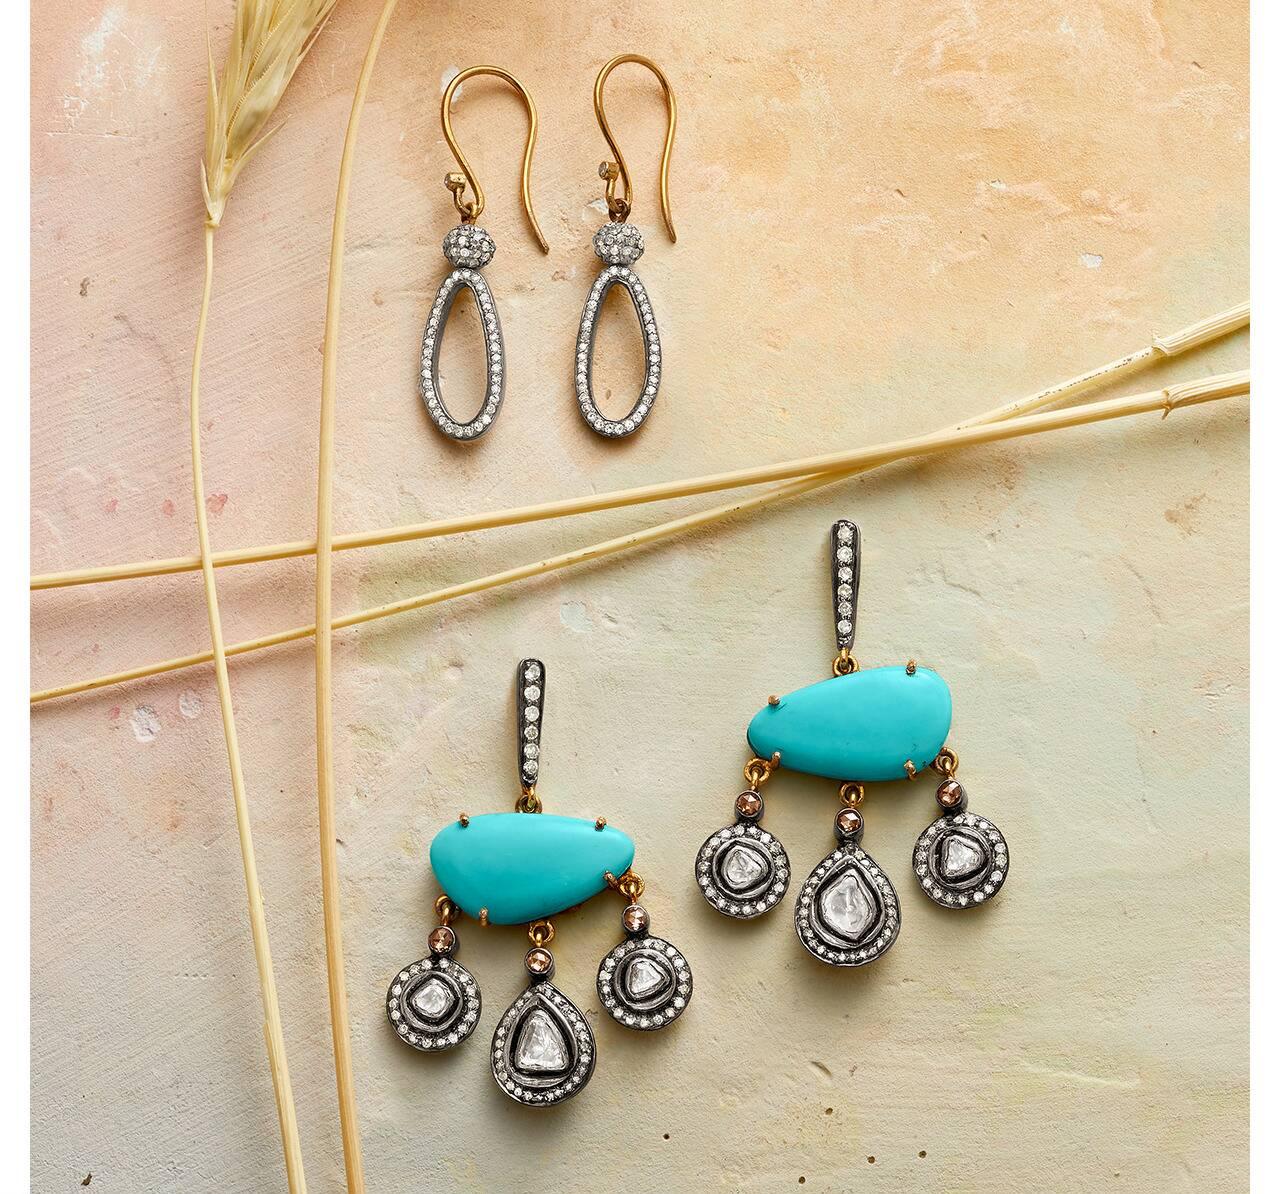 Shop Jewelry to Splurge On